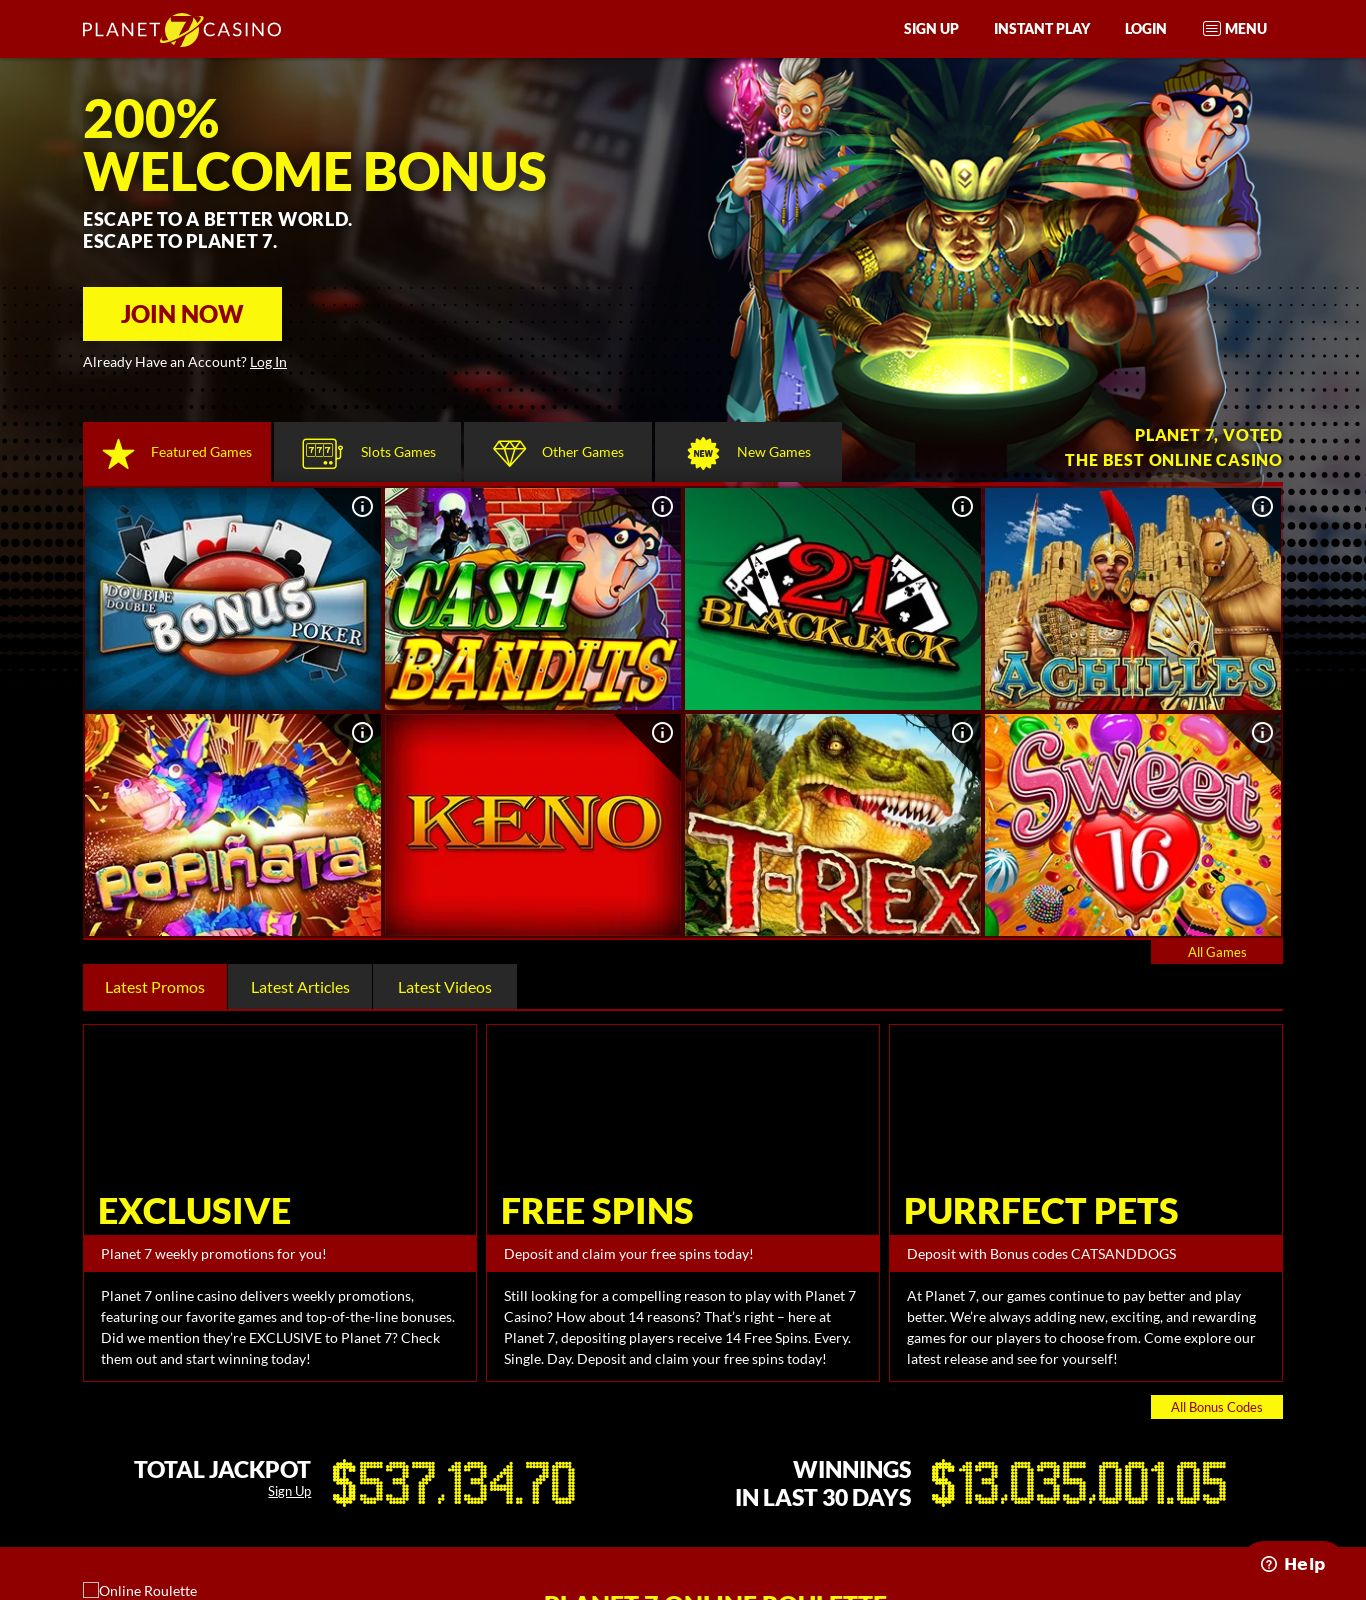 Planet 7 Casino Mobile App